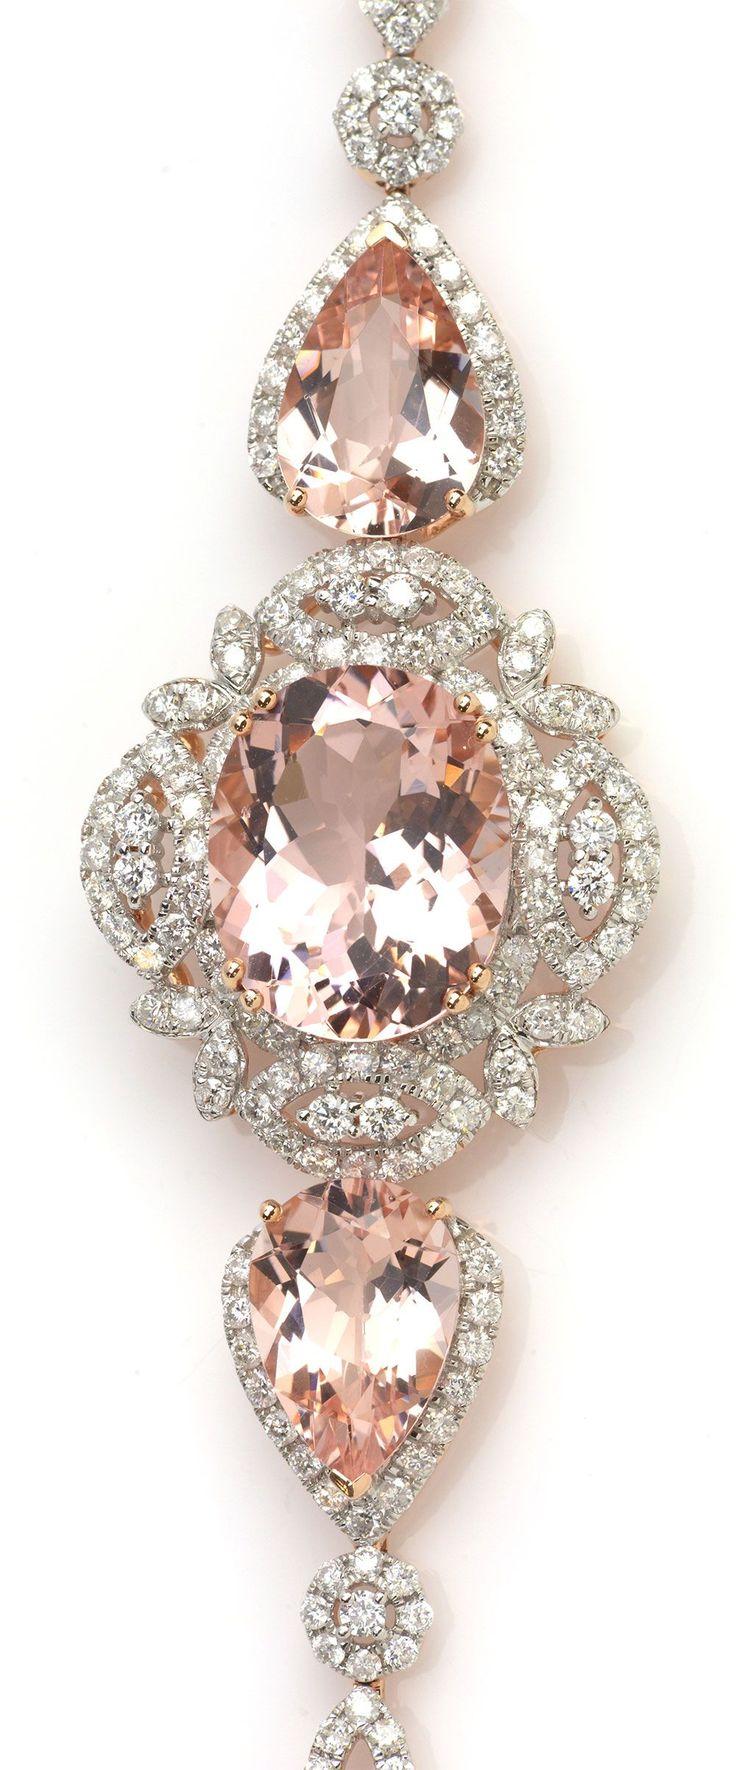 Pink Morganite & Rose Gold Diamond Bracelet. Item #416-133416 Michael Christoff 16.21 ctw Morganite Multi-shape & 2.70 ctw Diamond Round 14K Rose Gold Bracelet Length 7.25 - Gem Shopping Network